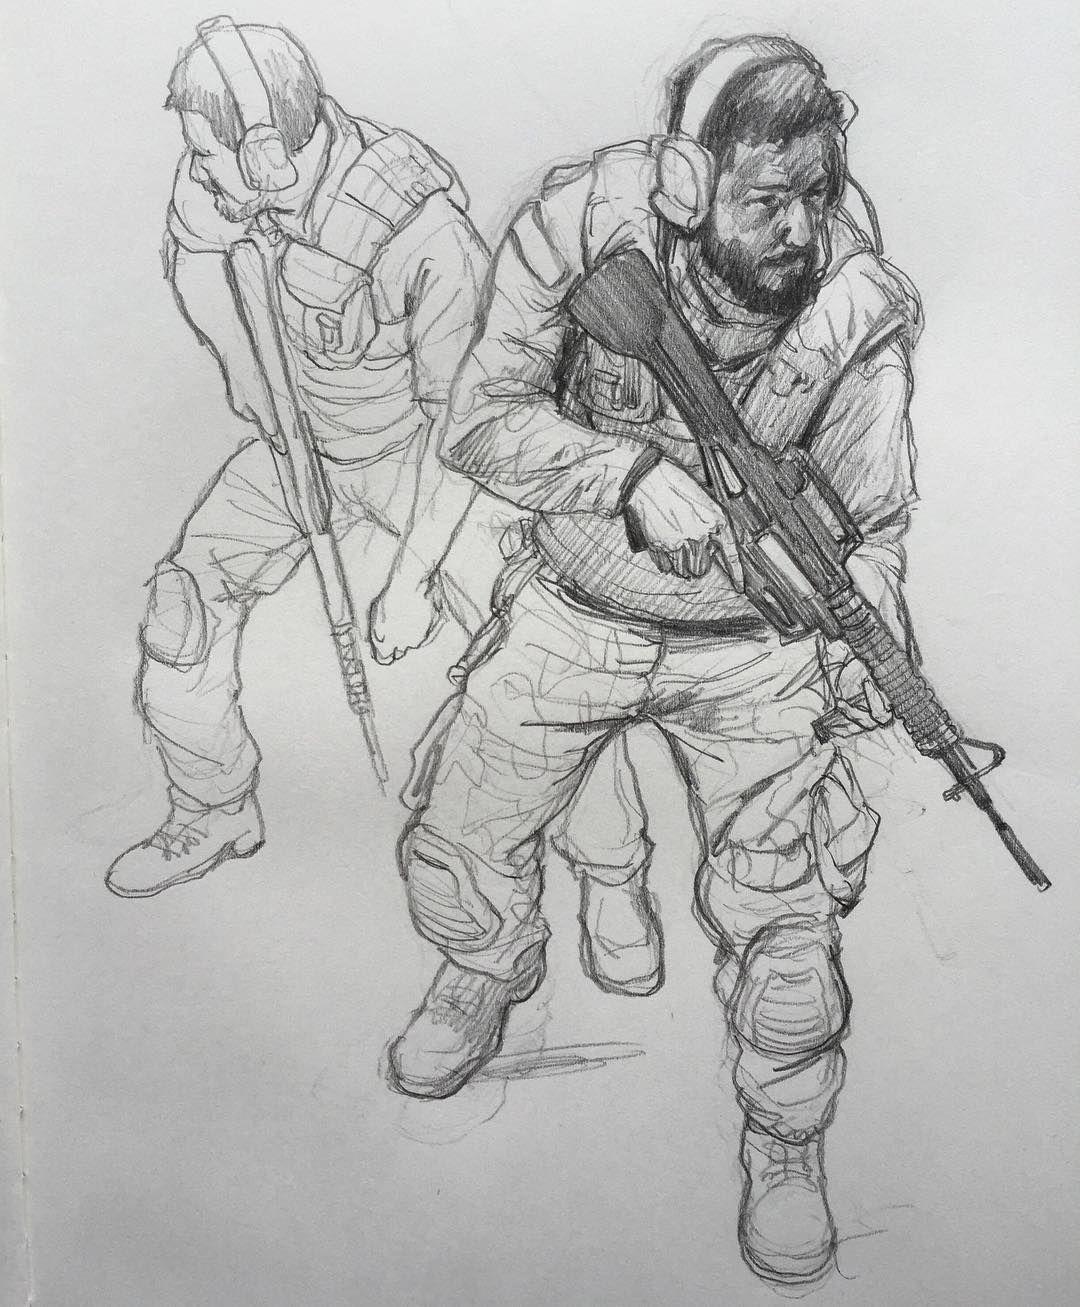 Soldier sketch drawing doodle pencildrawing pencilsketch pencil sketch sketching sketchbook art dailydoodle soldier gun warrior